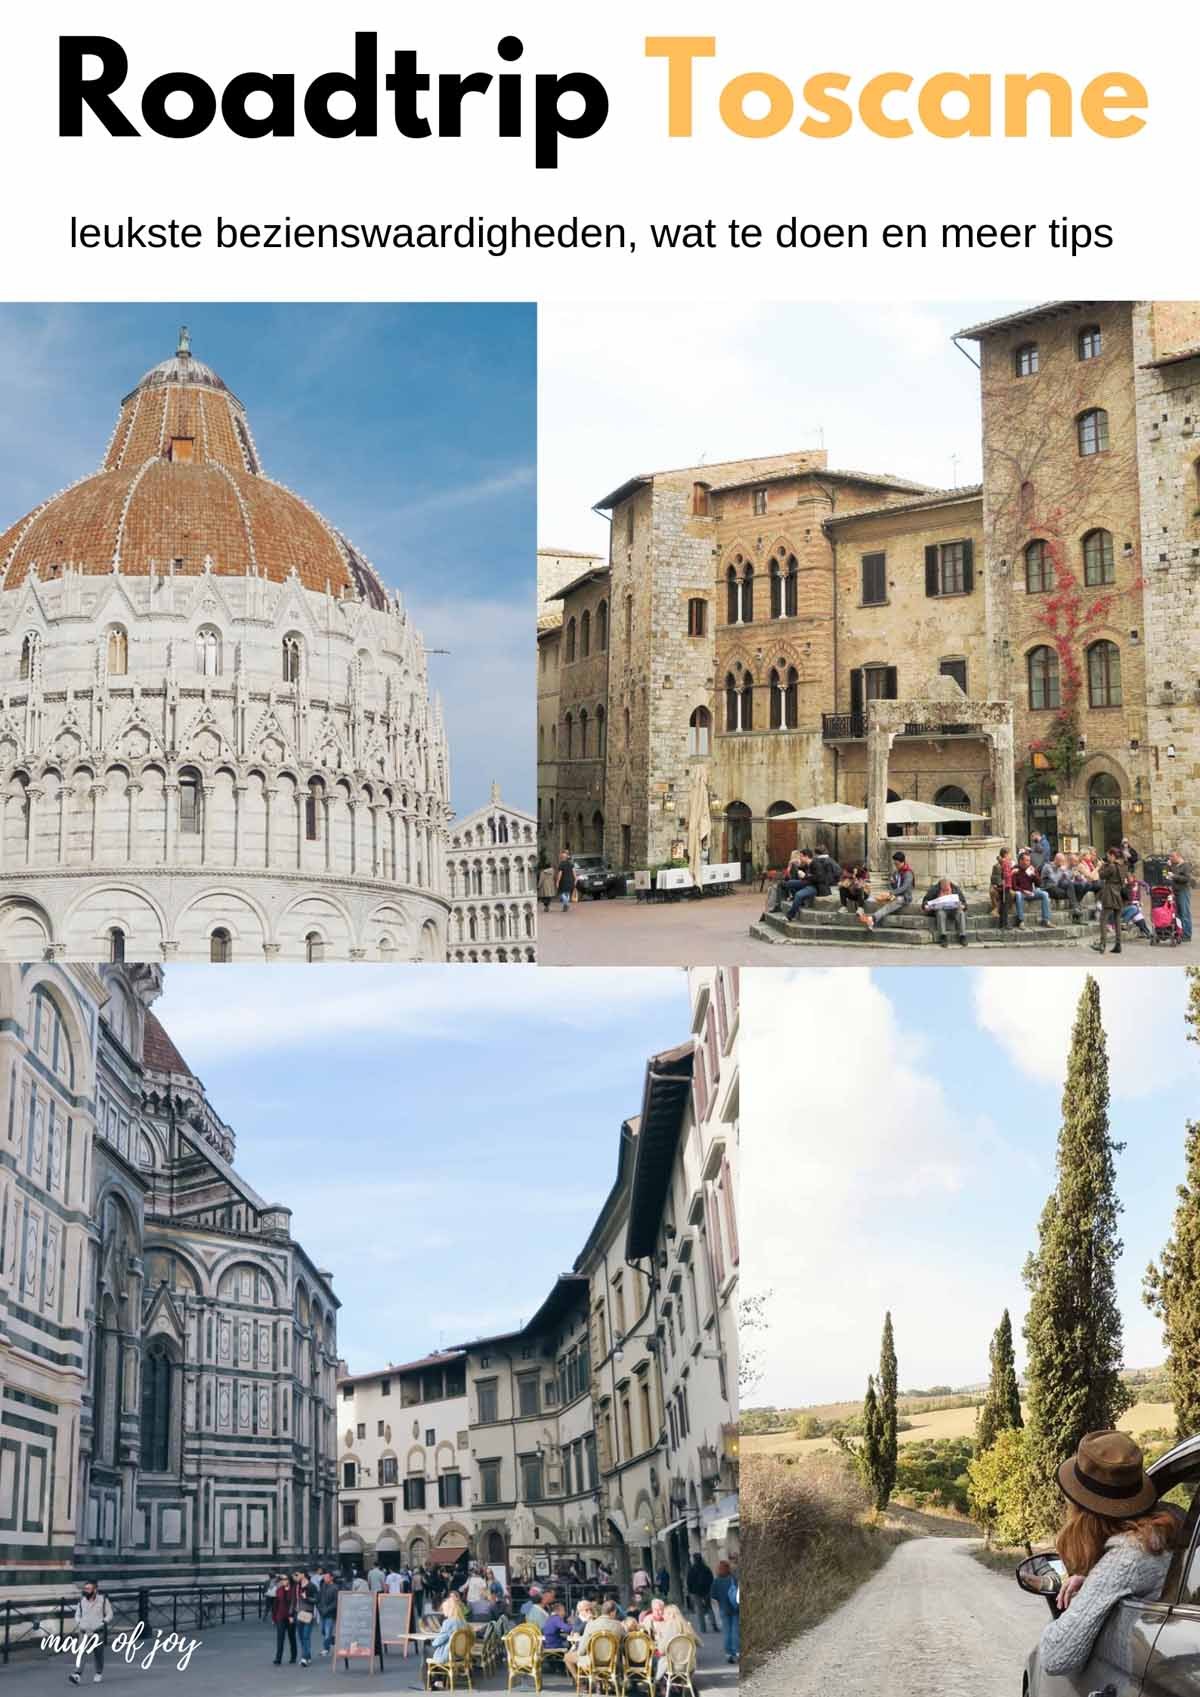 Roadtrip Toscane tips - Map of Joy